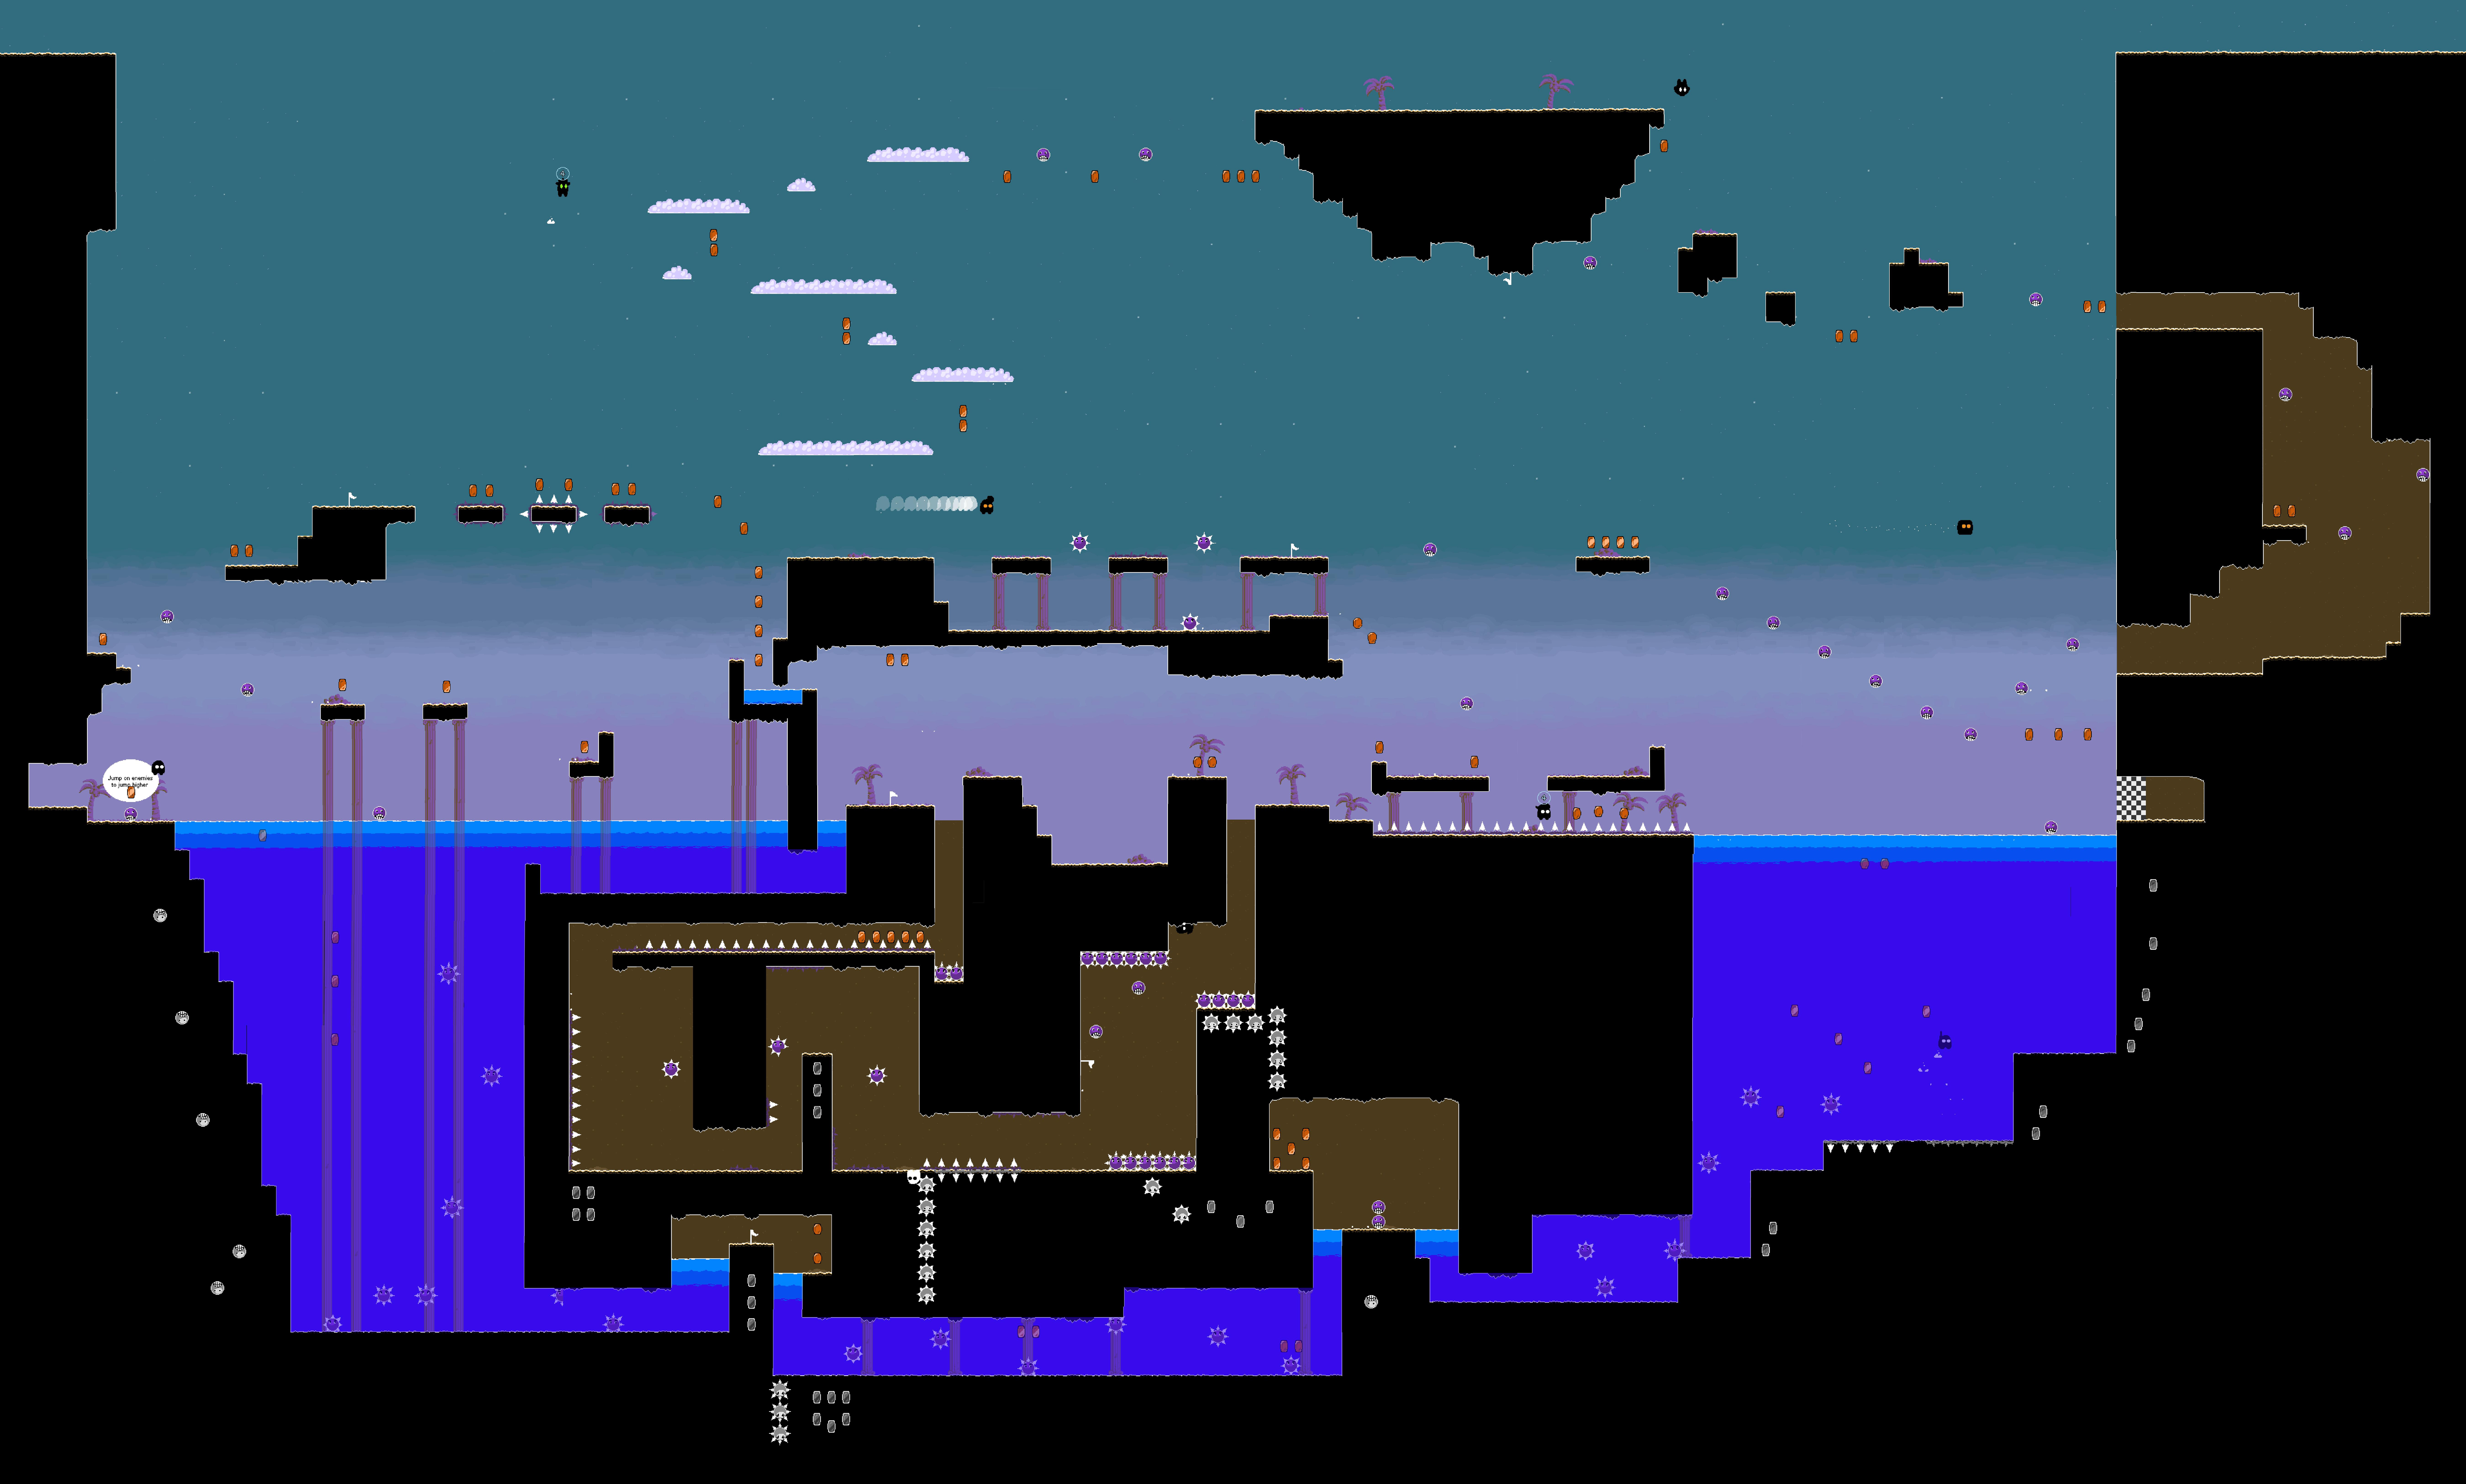 Level 1-1 Map